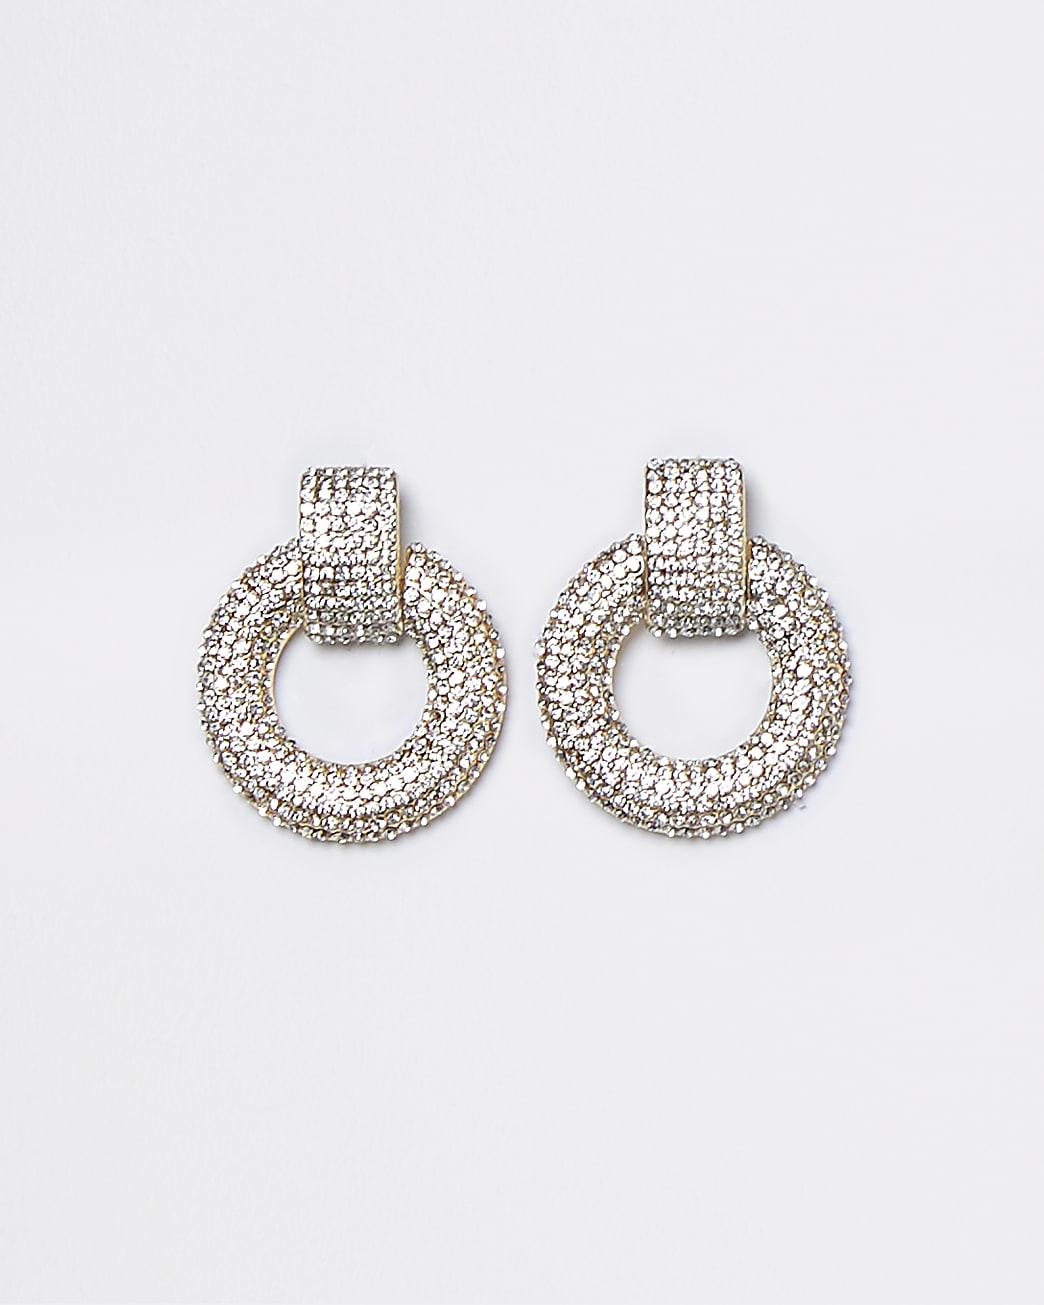 Gold pave mini door knocker earrings